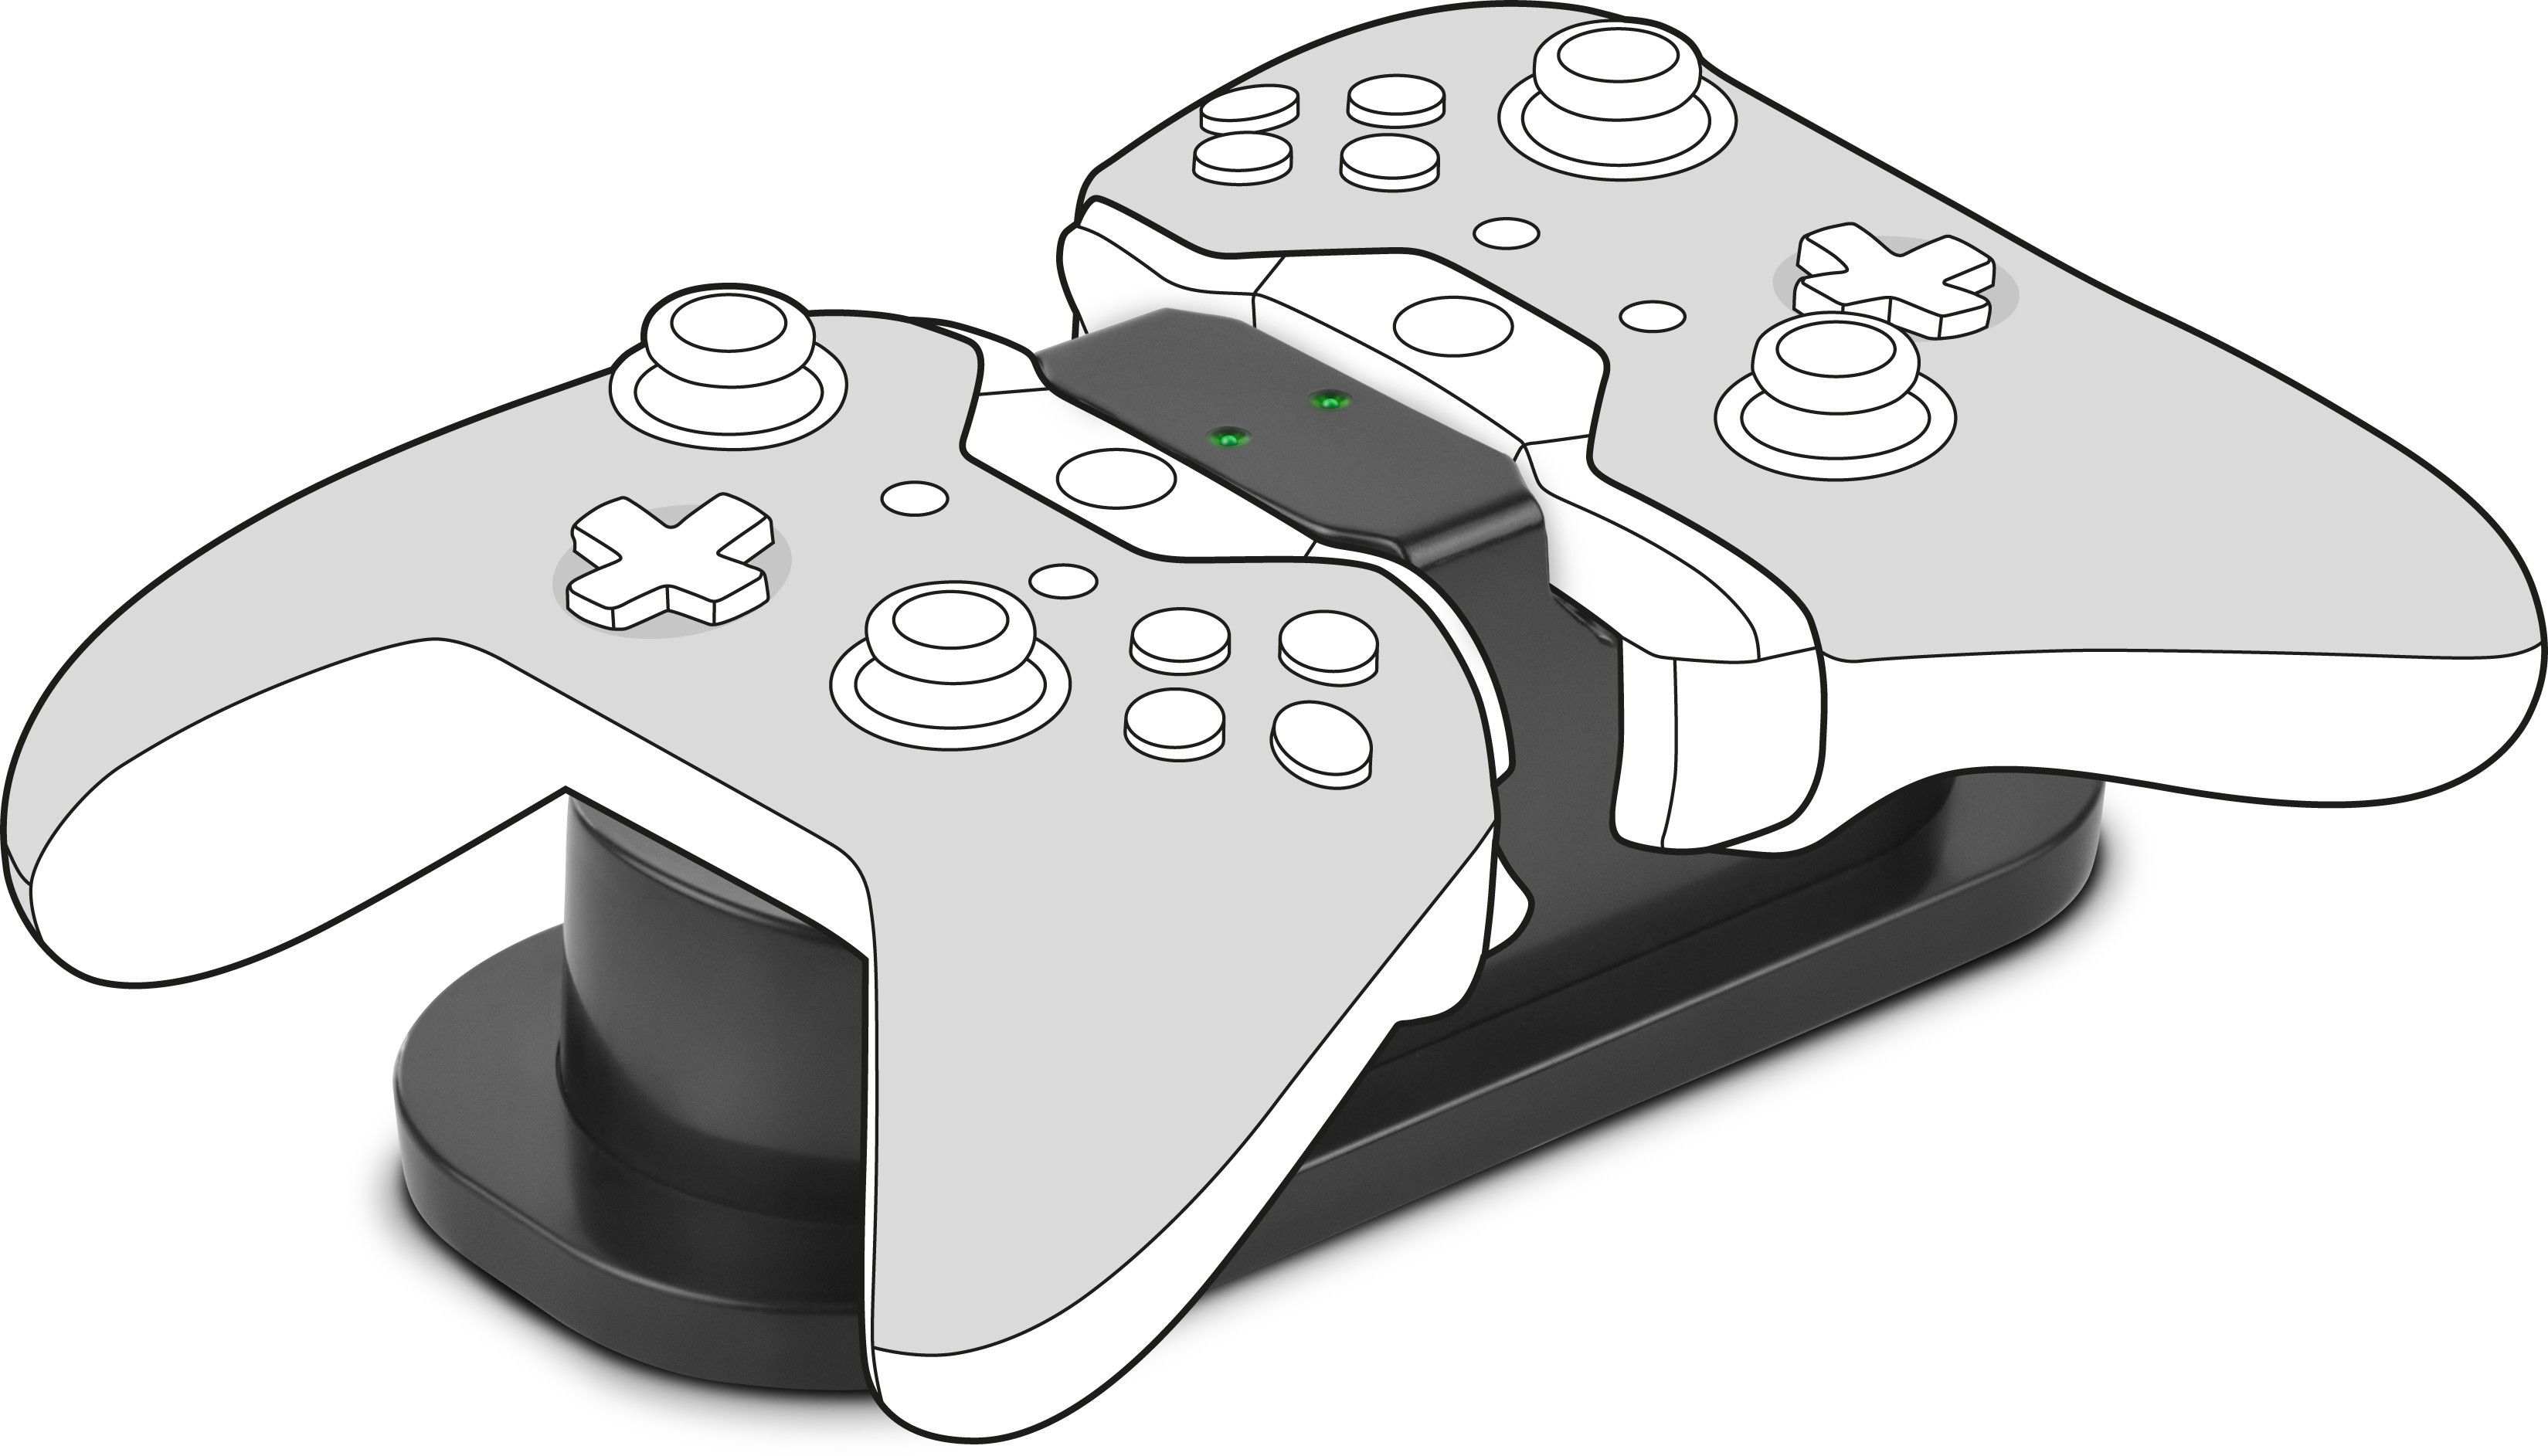 Speedlink lādētājs Twindock Xbox, melns (SL-250000-BK) 4027301511024 spēļu aksesuārs